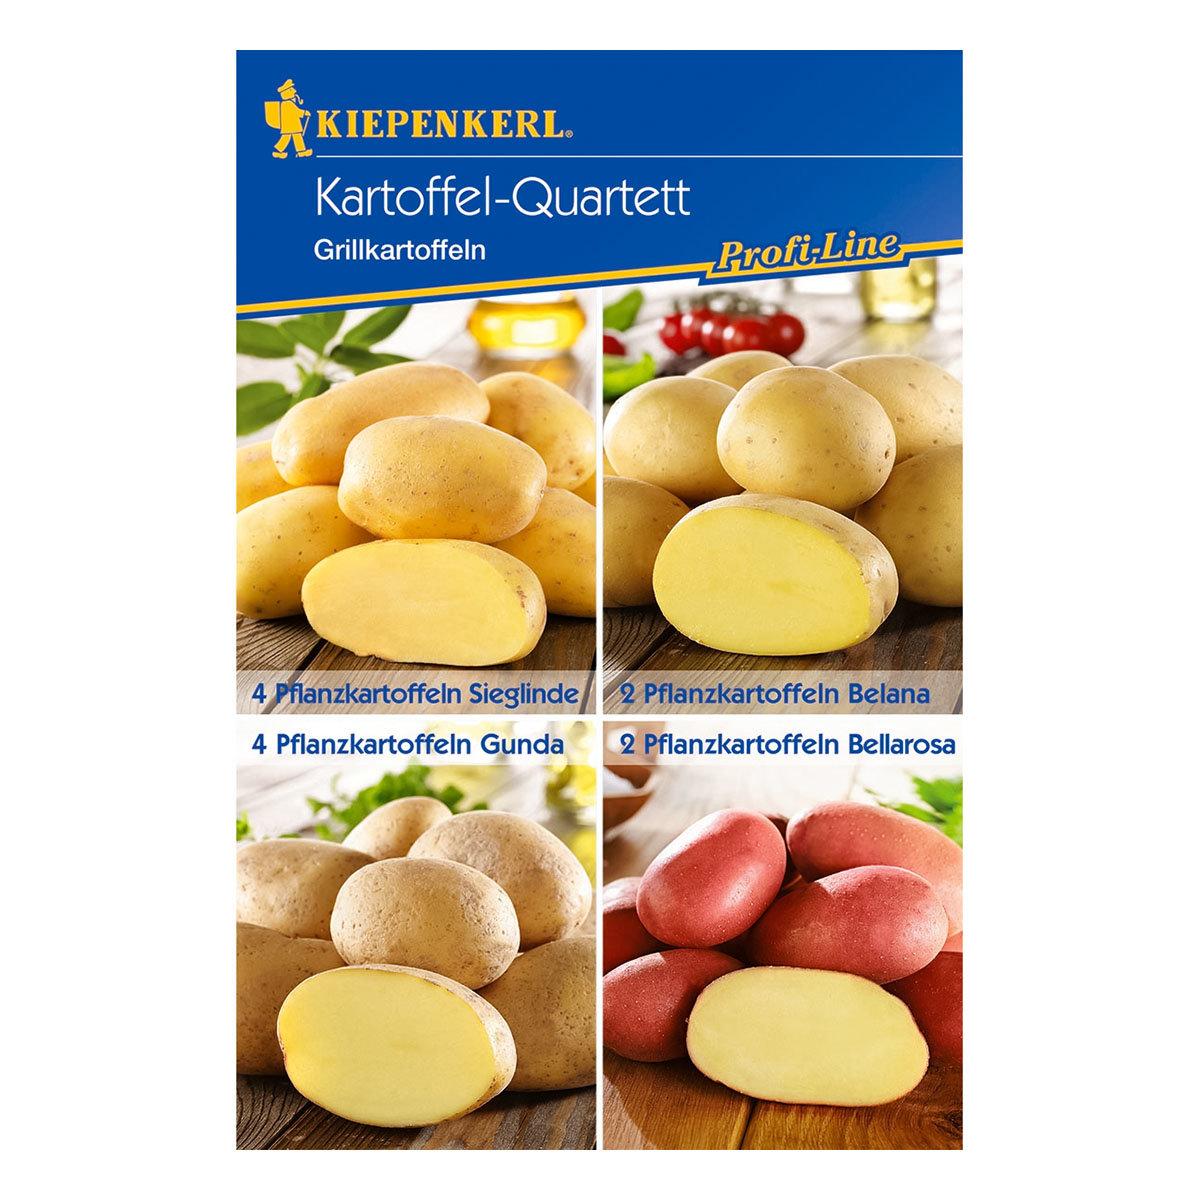 Kartoffel-Quartett Grillkartoffeln, 12 Stück | #2